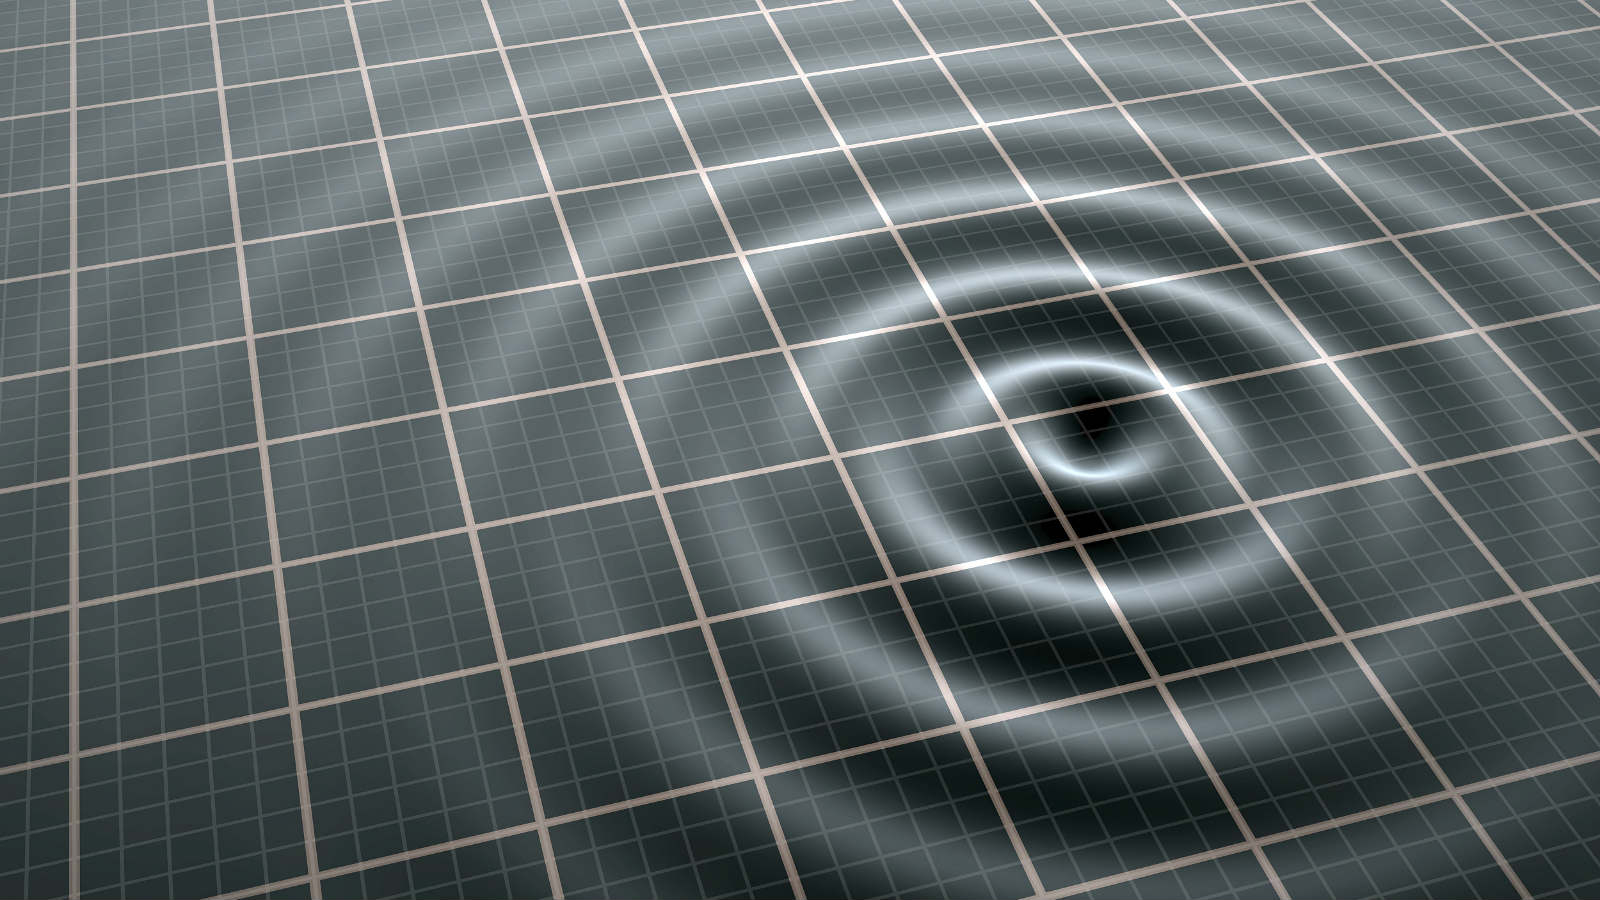 5.3-magnitude quake hits south of the Fiji Islands